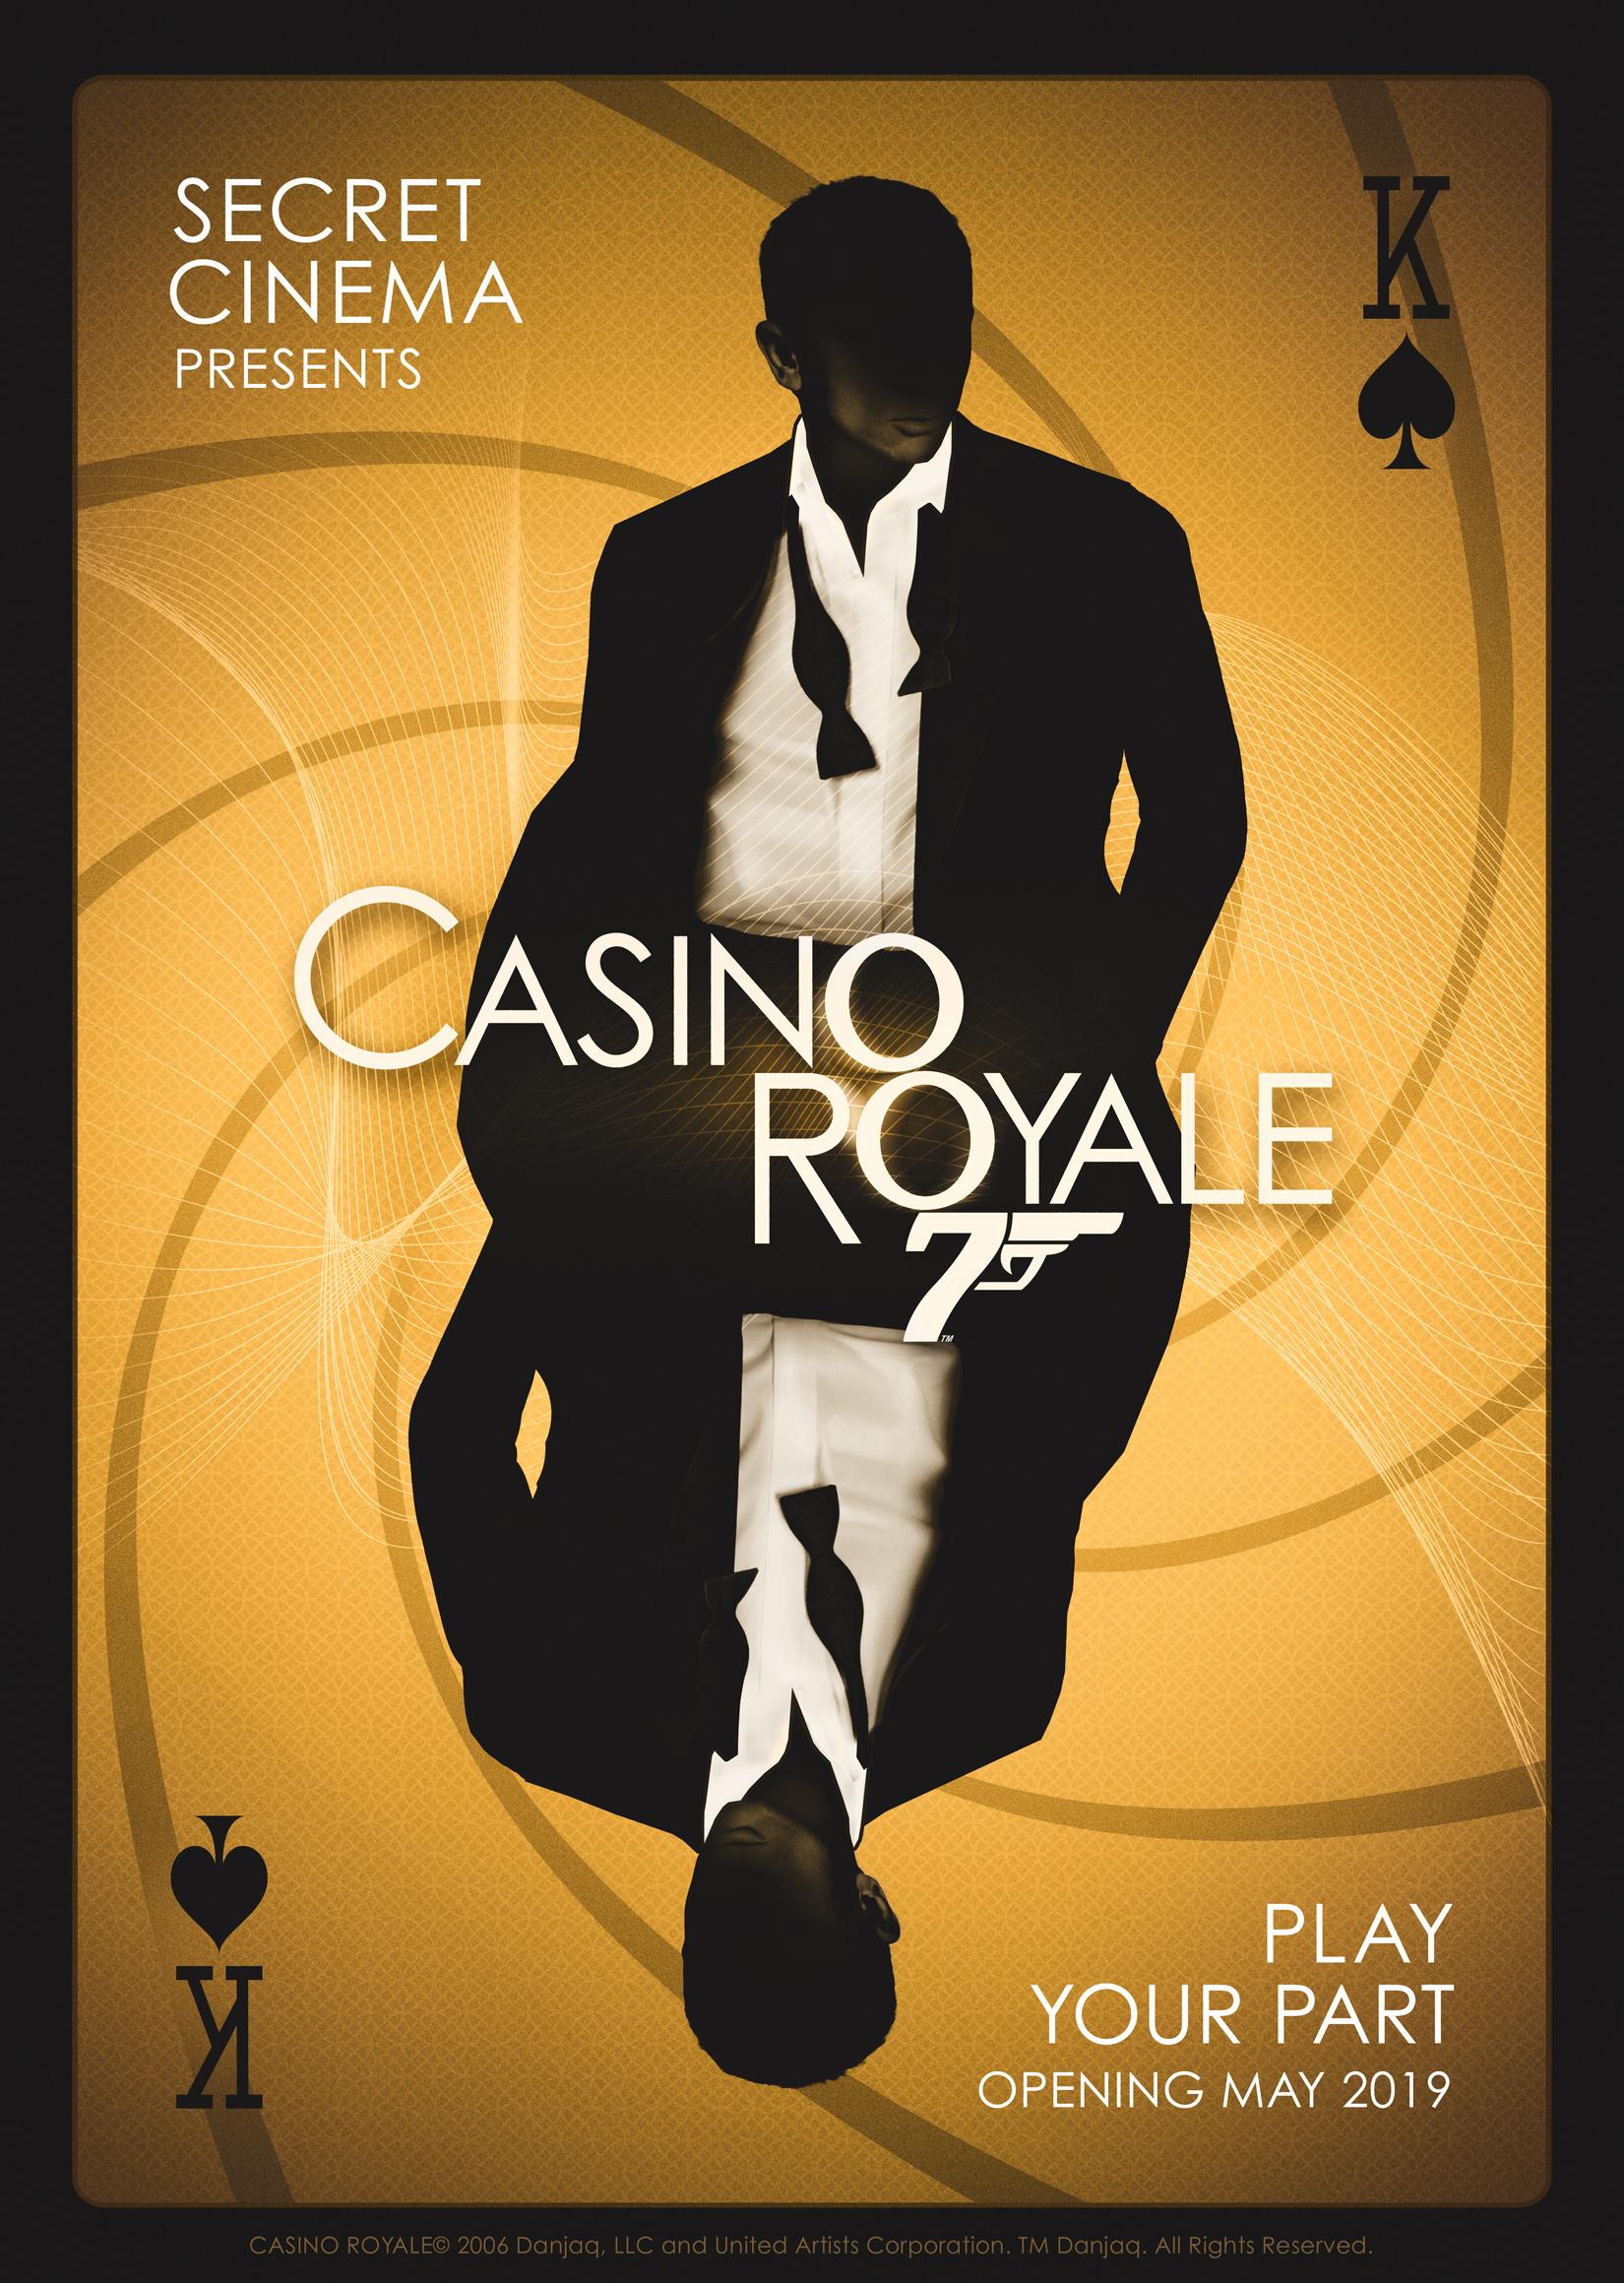 Secret Cinema Presents Casino Royale - POSTER ARTWORK